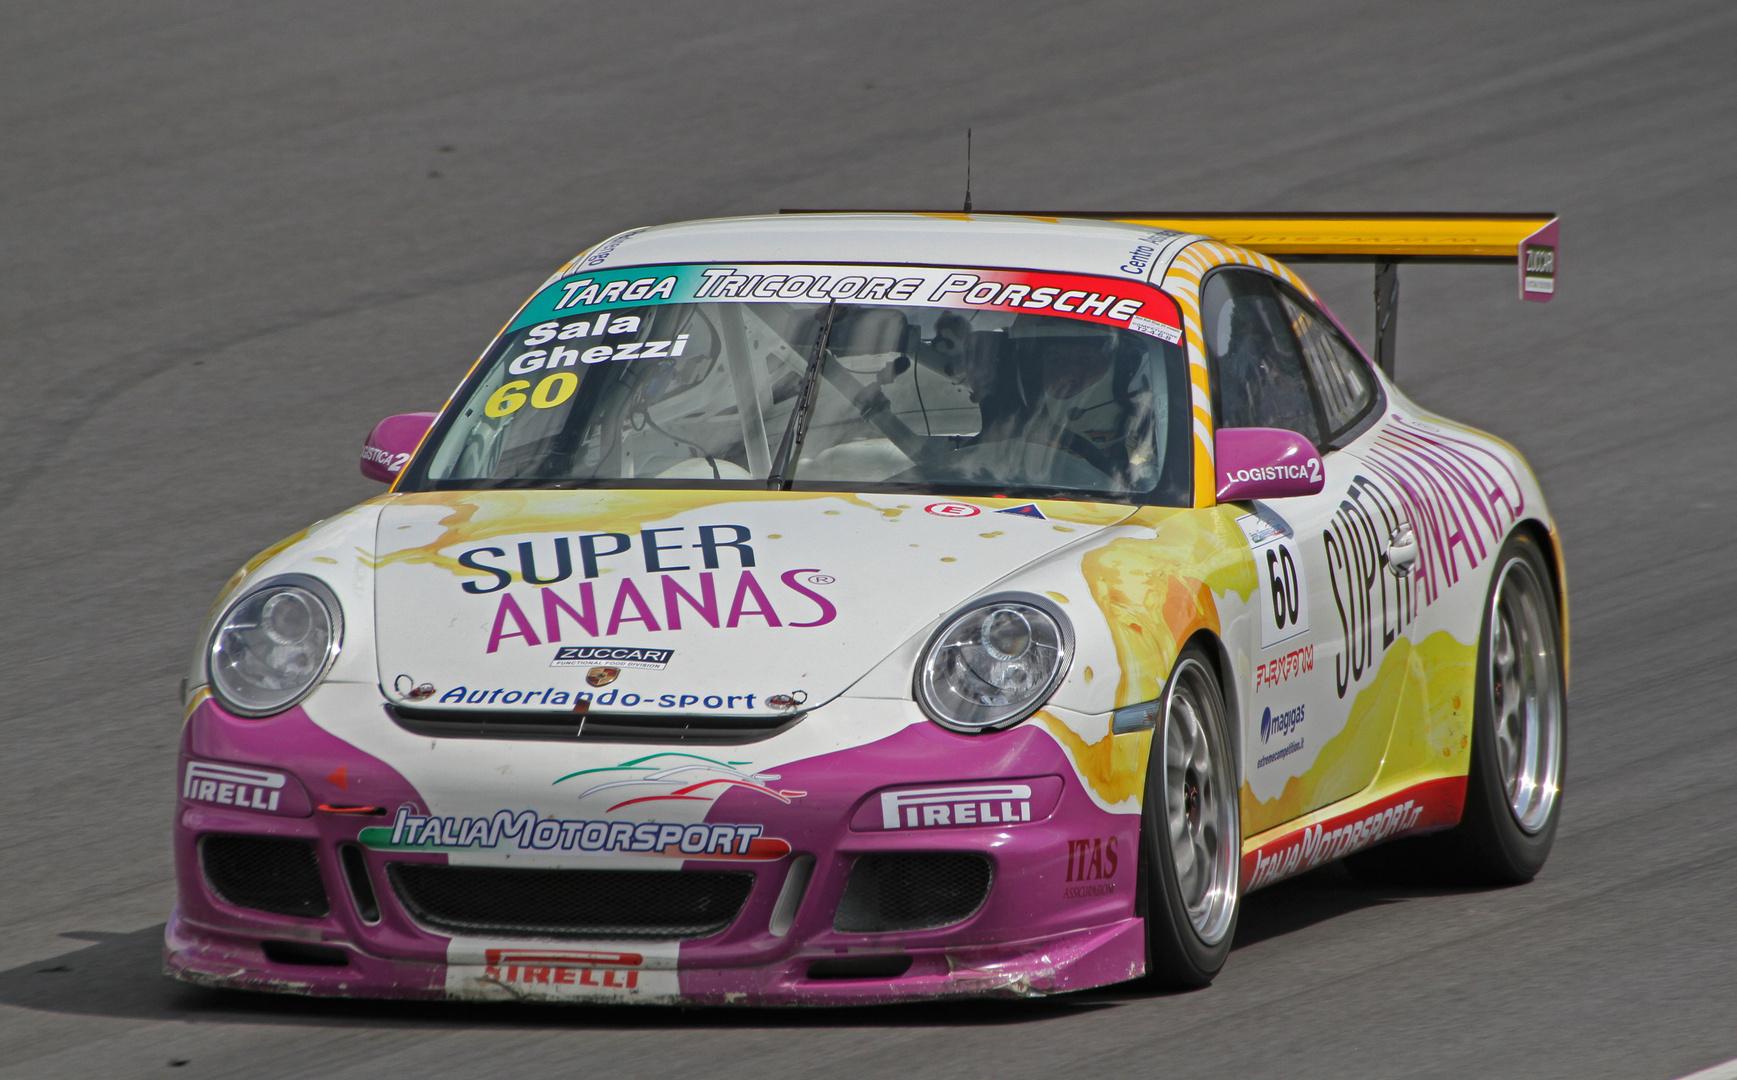 Targa Tricolore Porsche